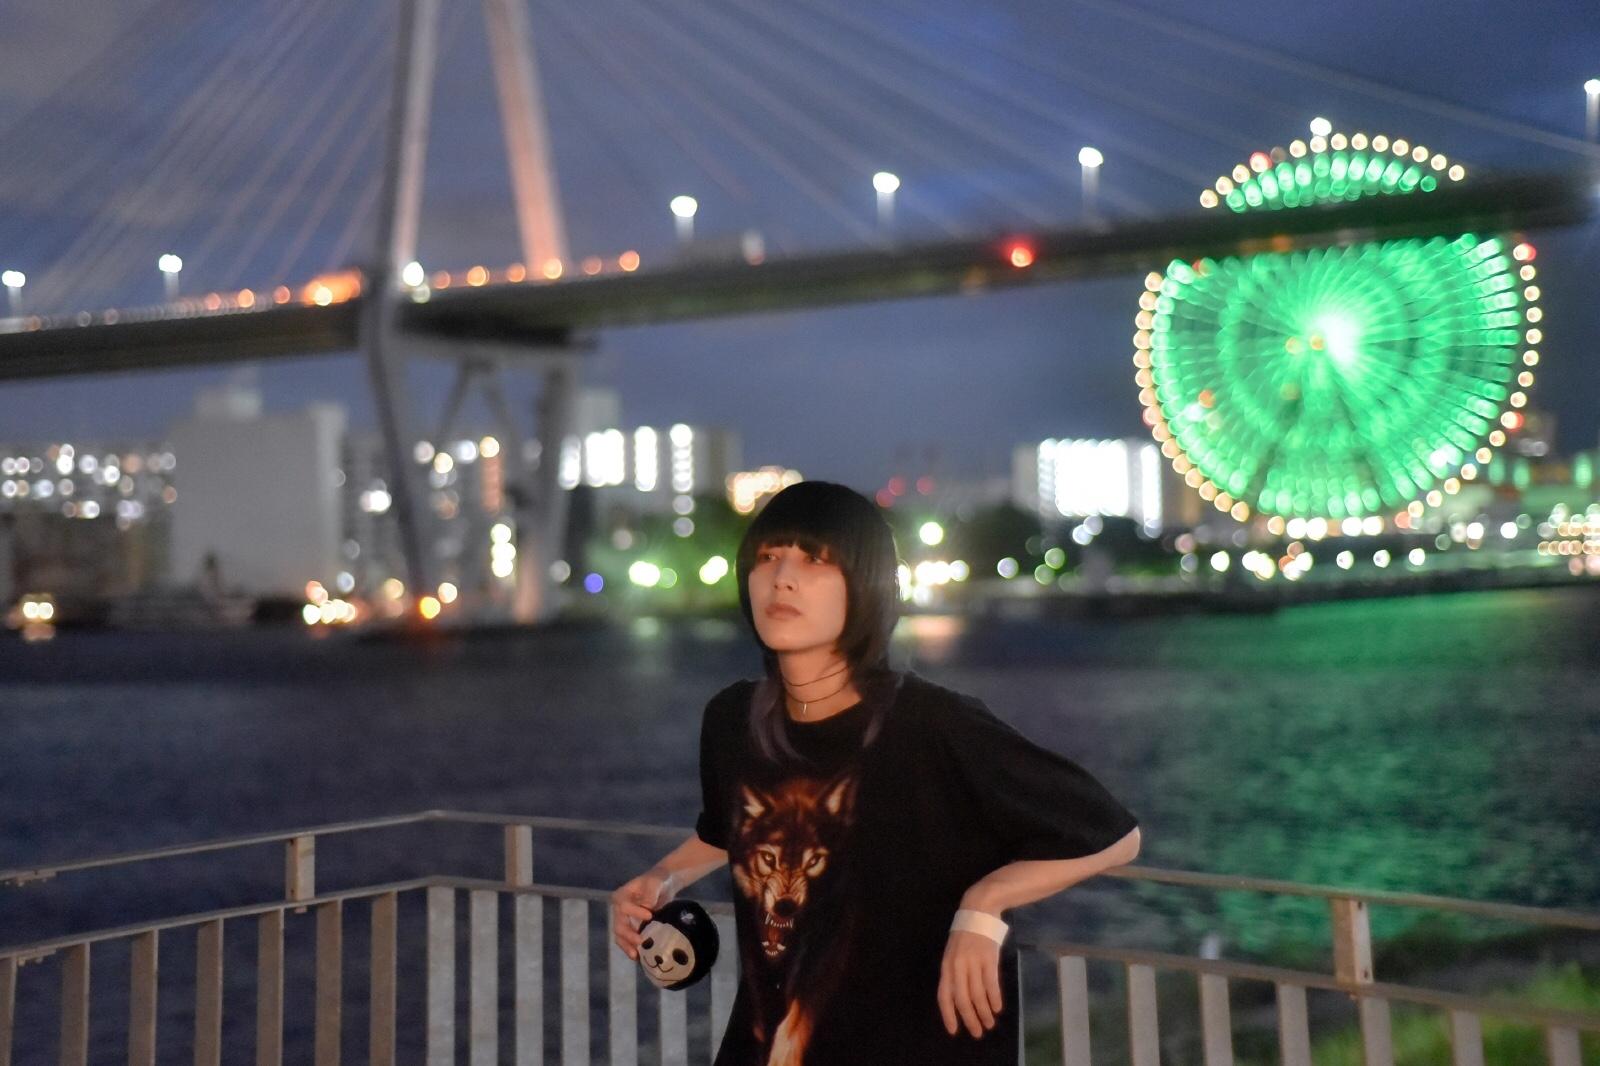 photo by @hub_05